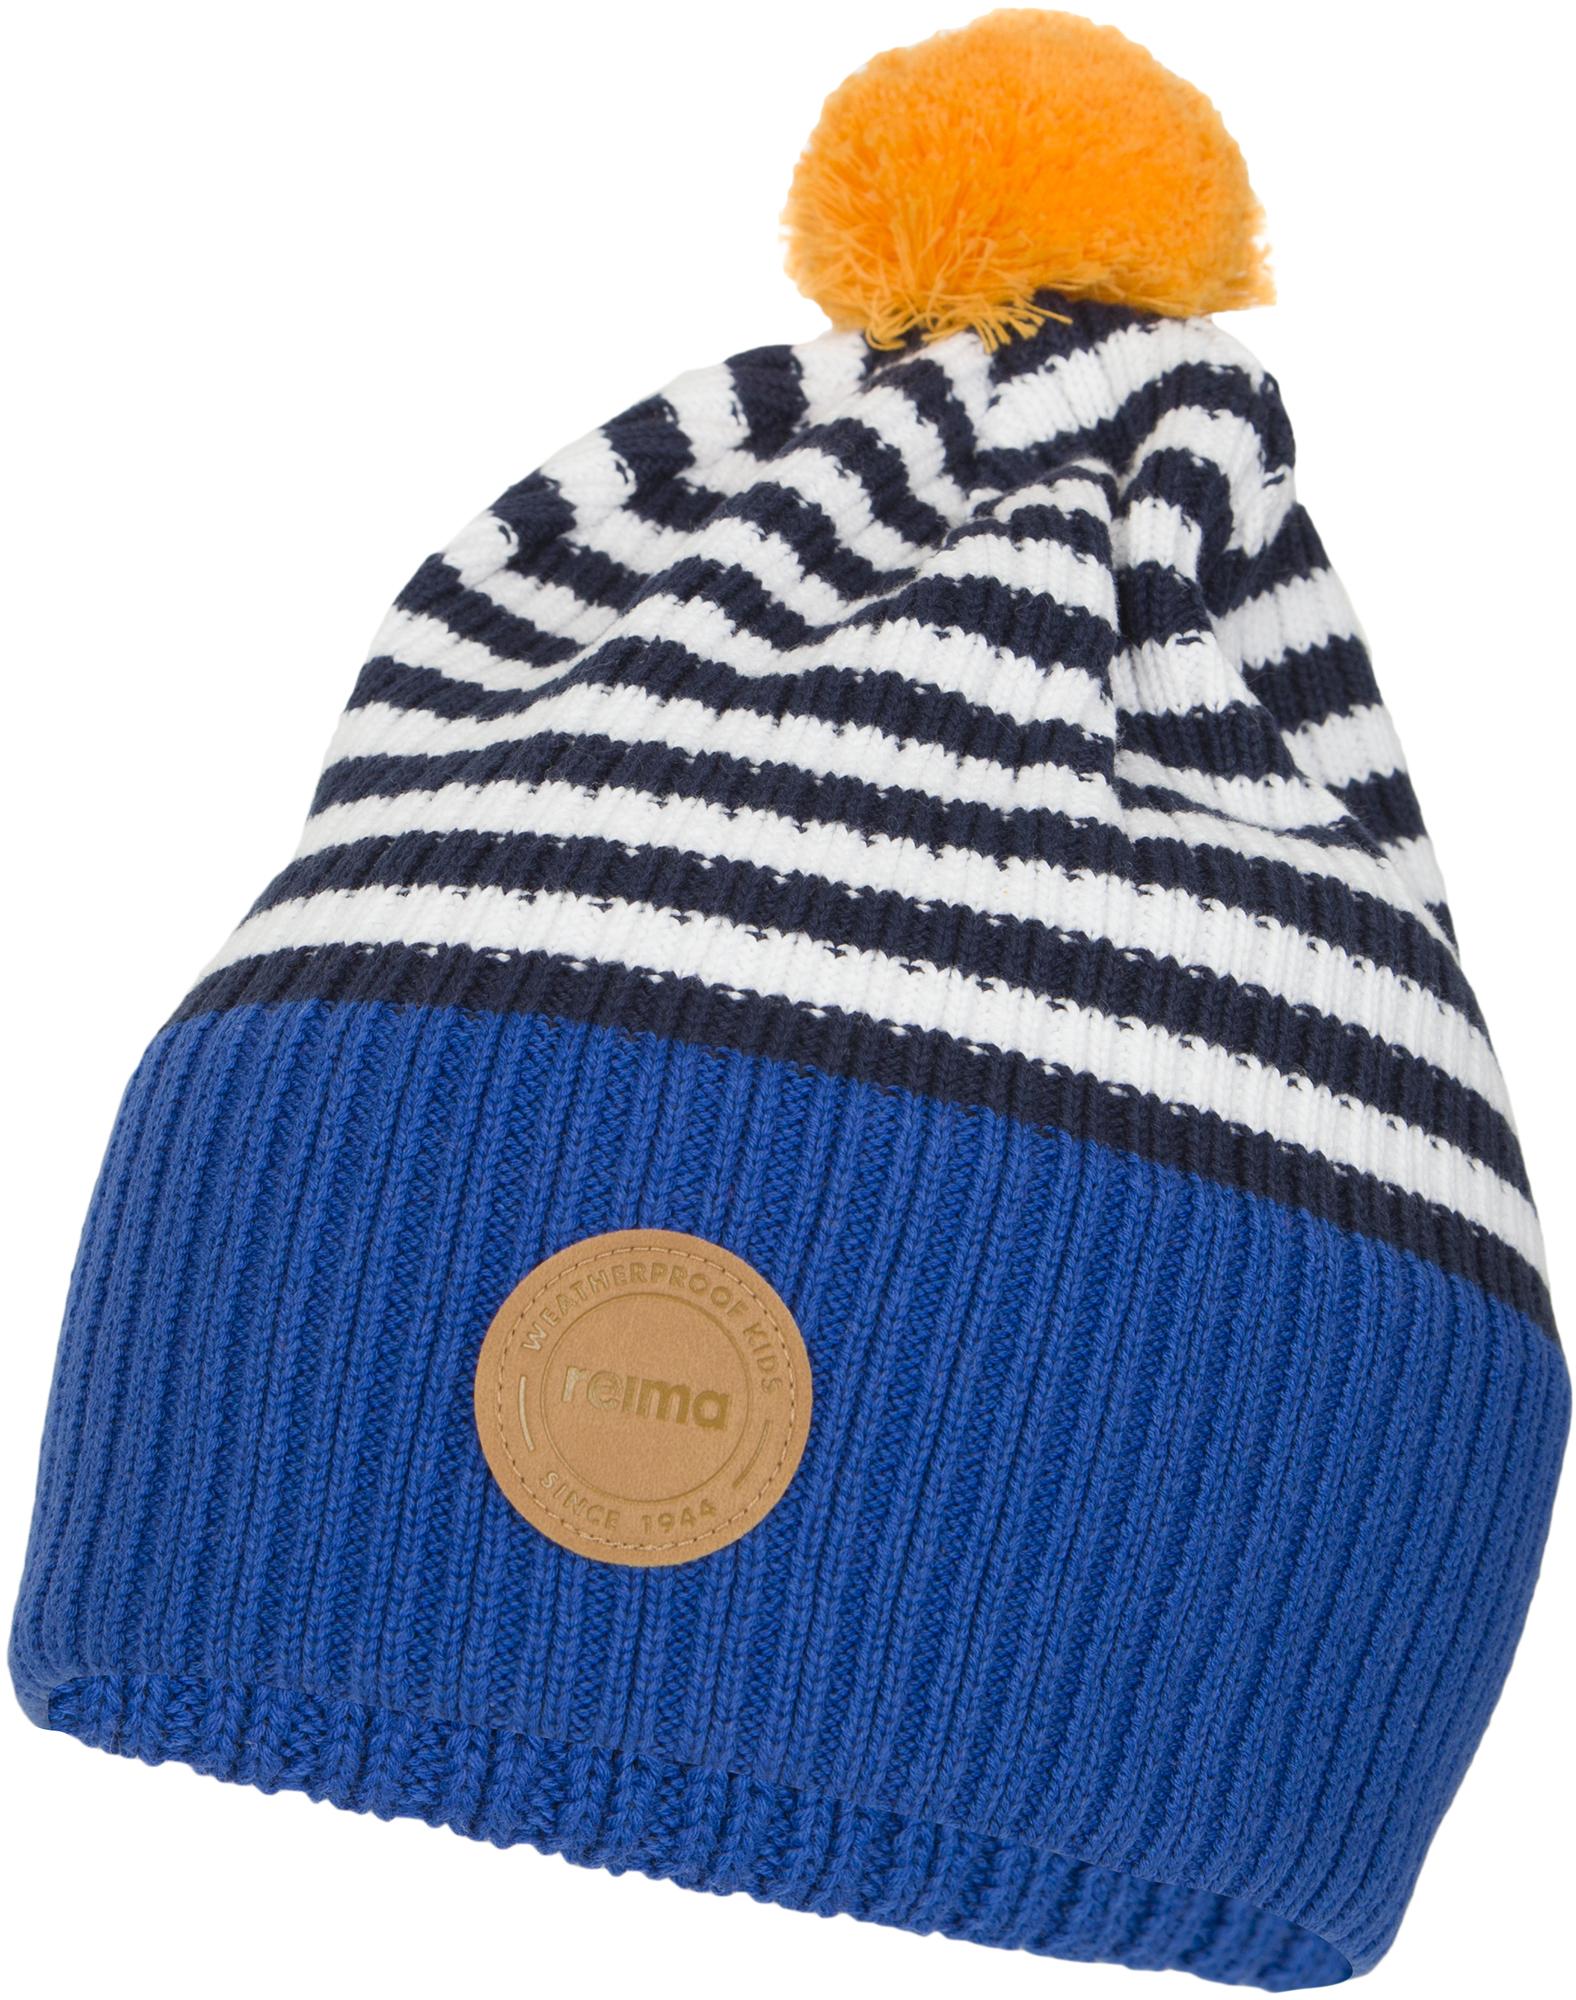 Reima Шапка для мальчиков Reima Beanie Tokko, размер 56 reima шапка lilja белый меланж